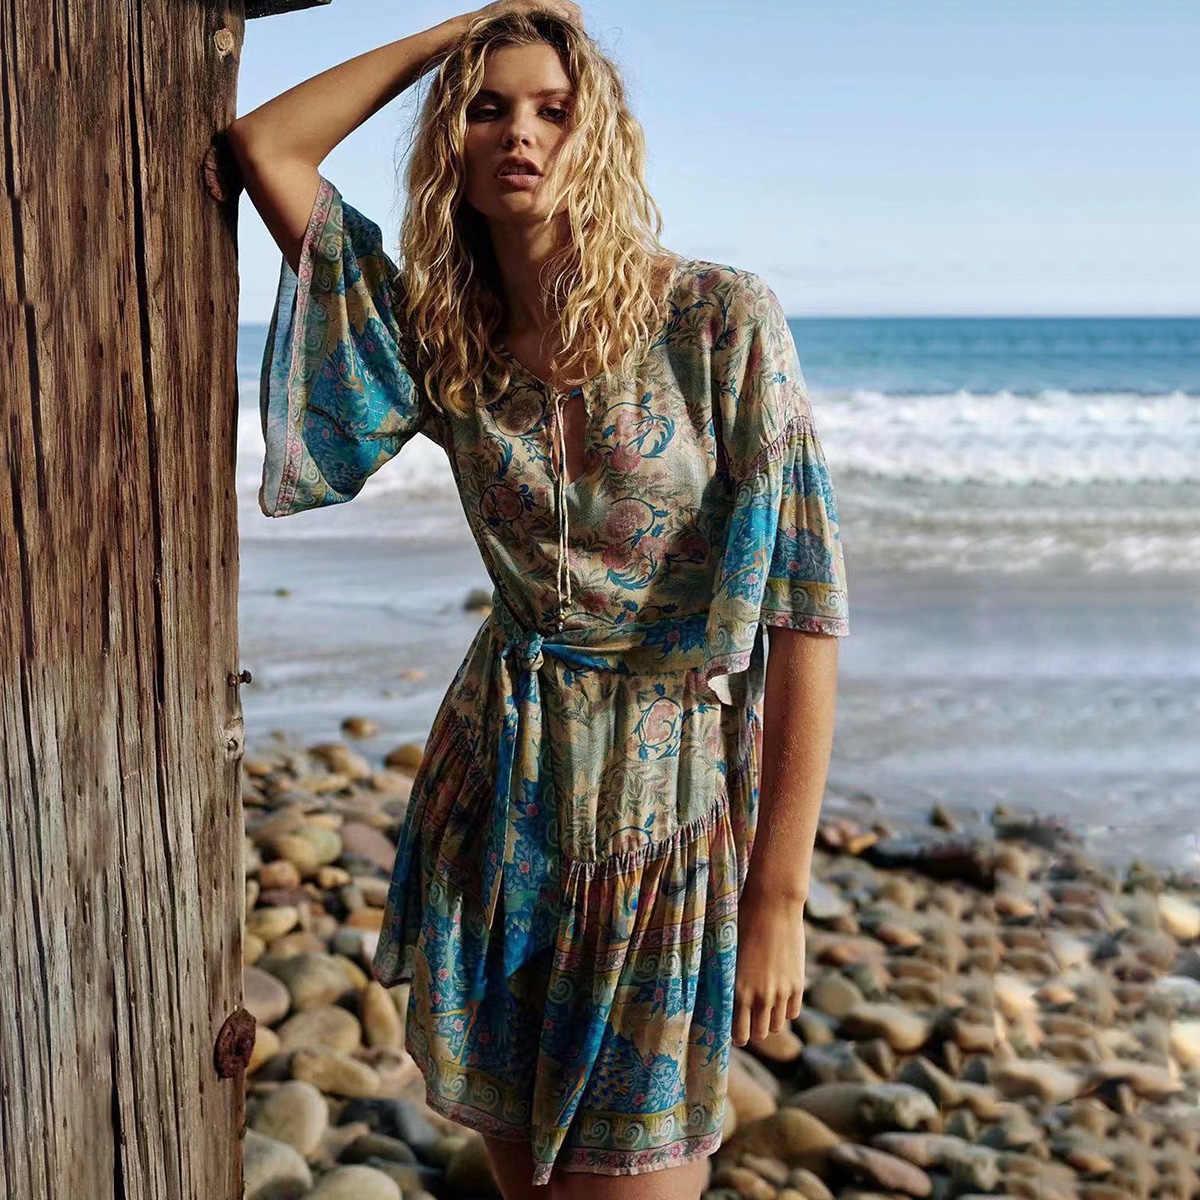 42533a047697 Jastie Gypsy Oasis Mini Dress Drop Waist Ruffle Hem Boho Beach Dresses  Pleated Sleeve Casual Women